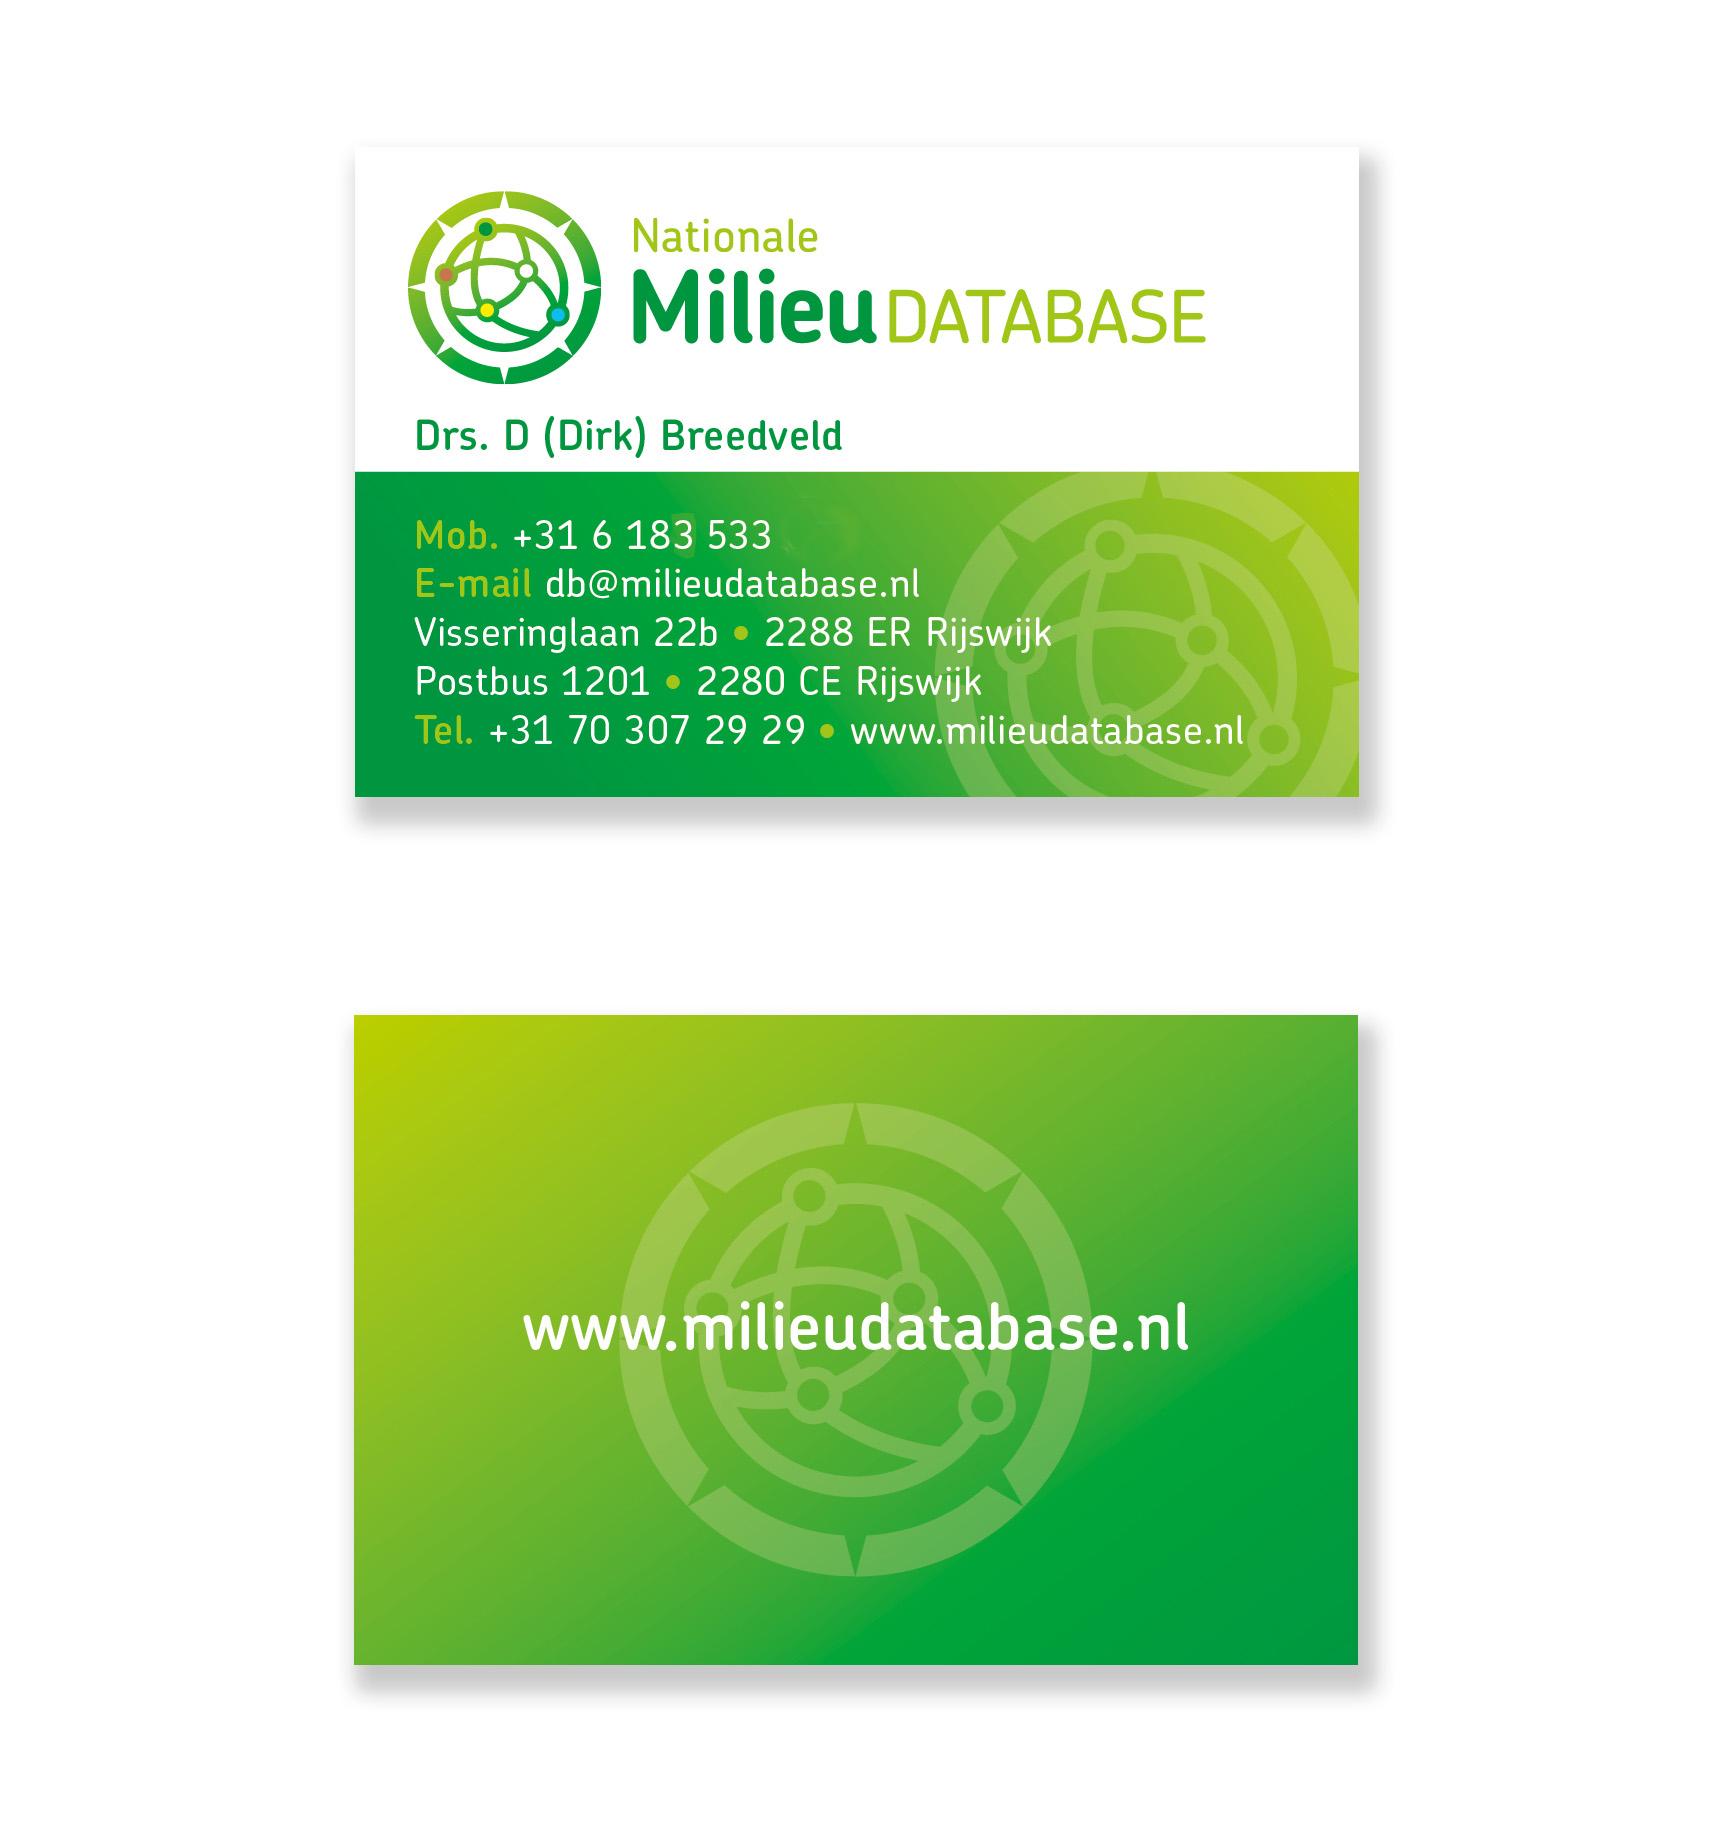 Milieudatabase_visite_kaartjes